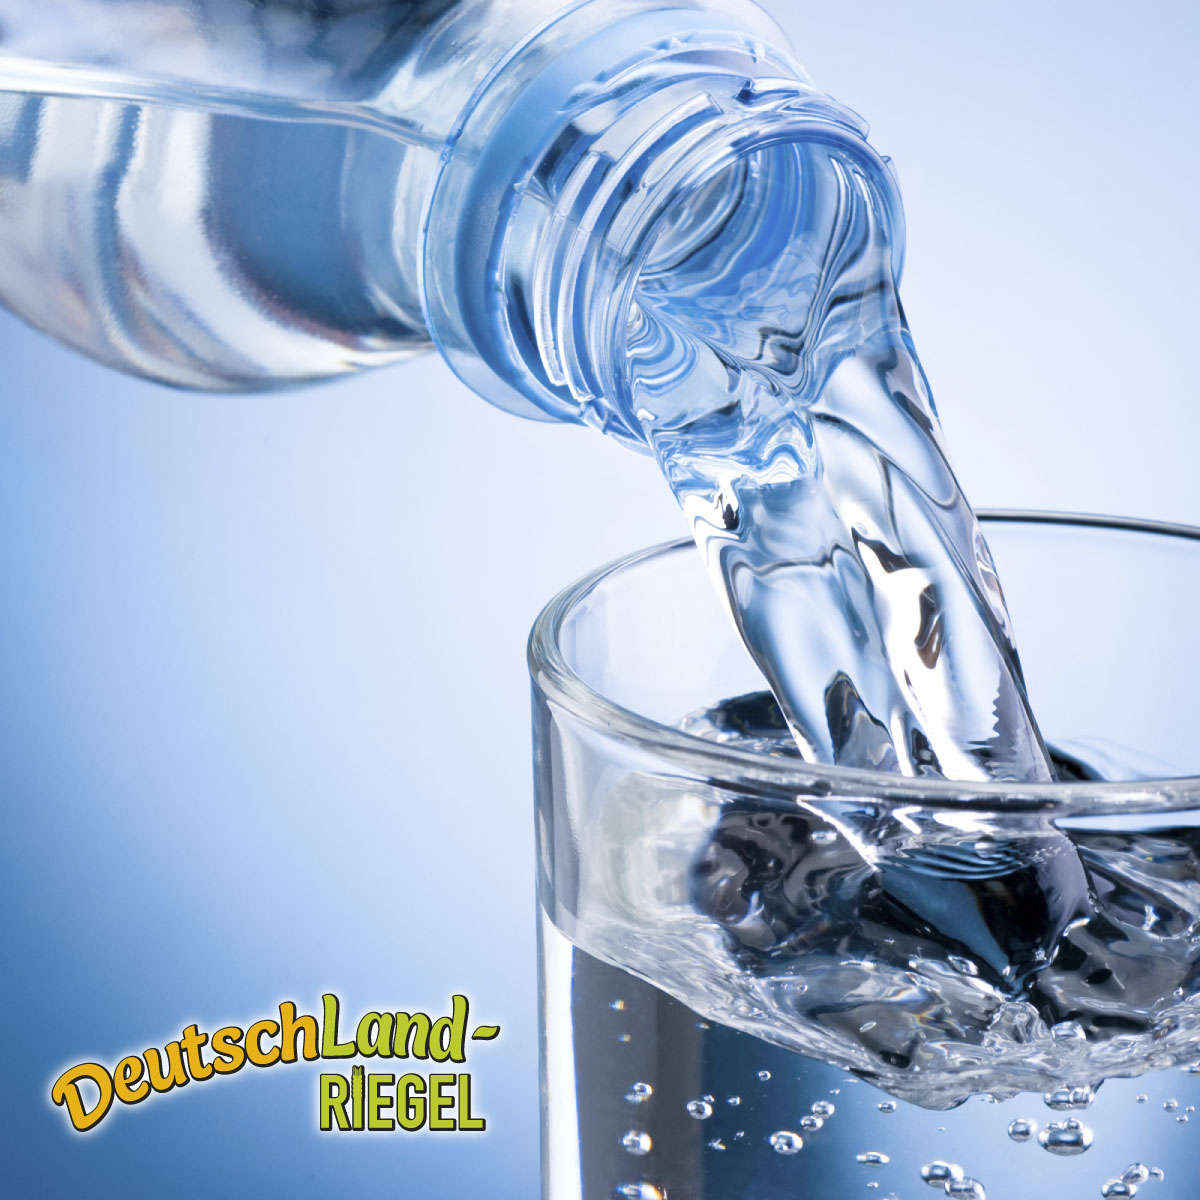 Magnesium in Lebensmitteln, Magnesiumgehalt Wasser